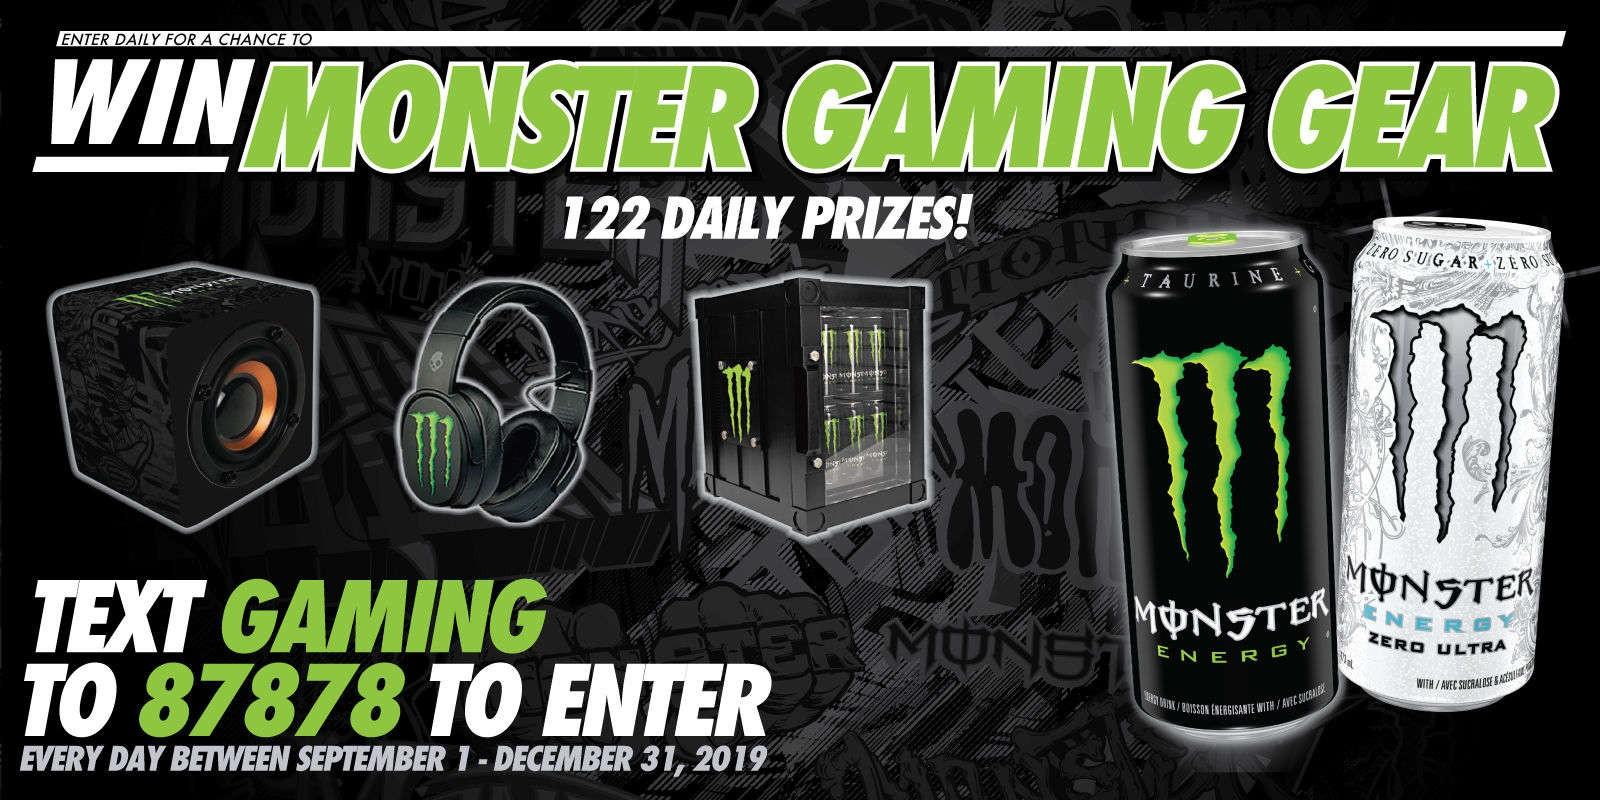 Win Monster Gaming Gear